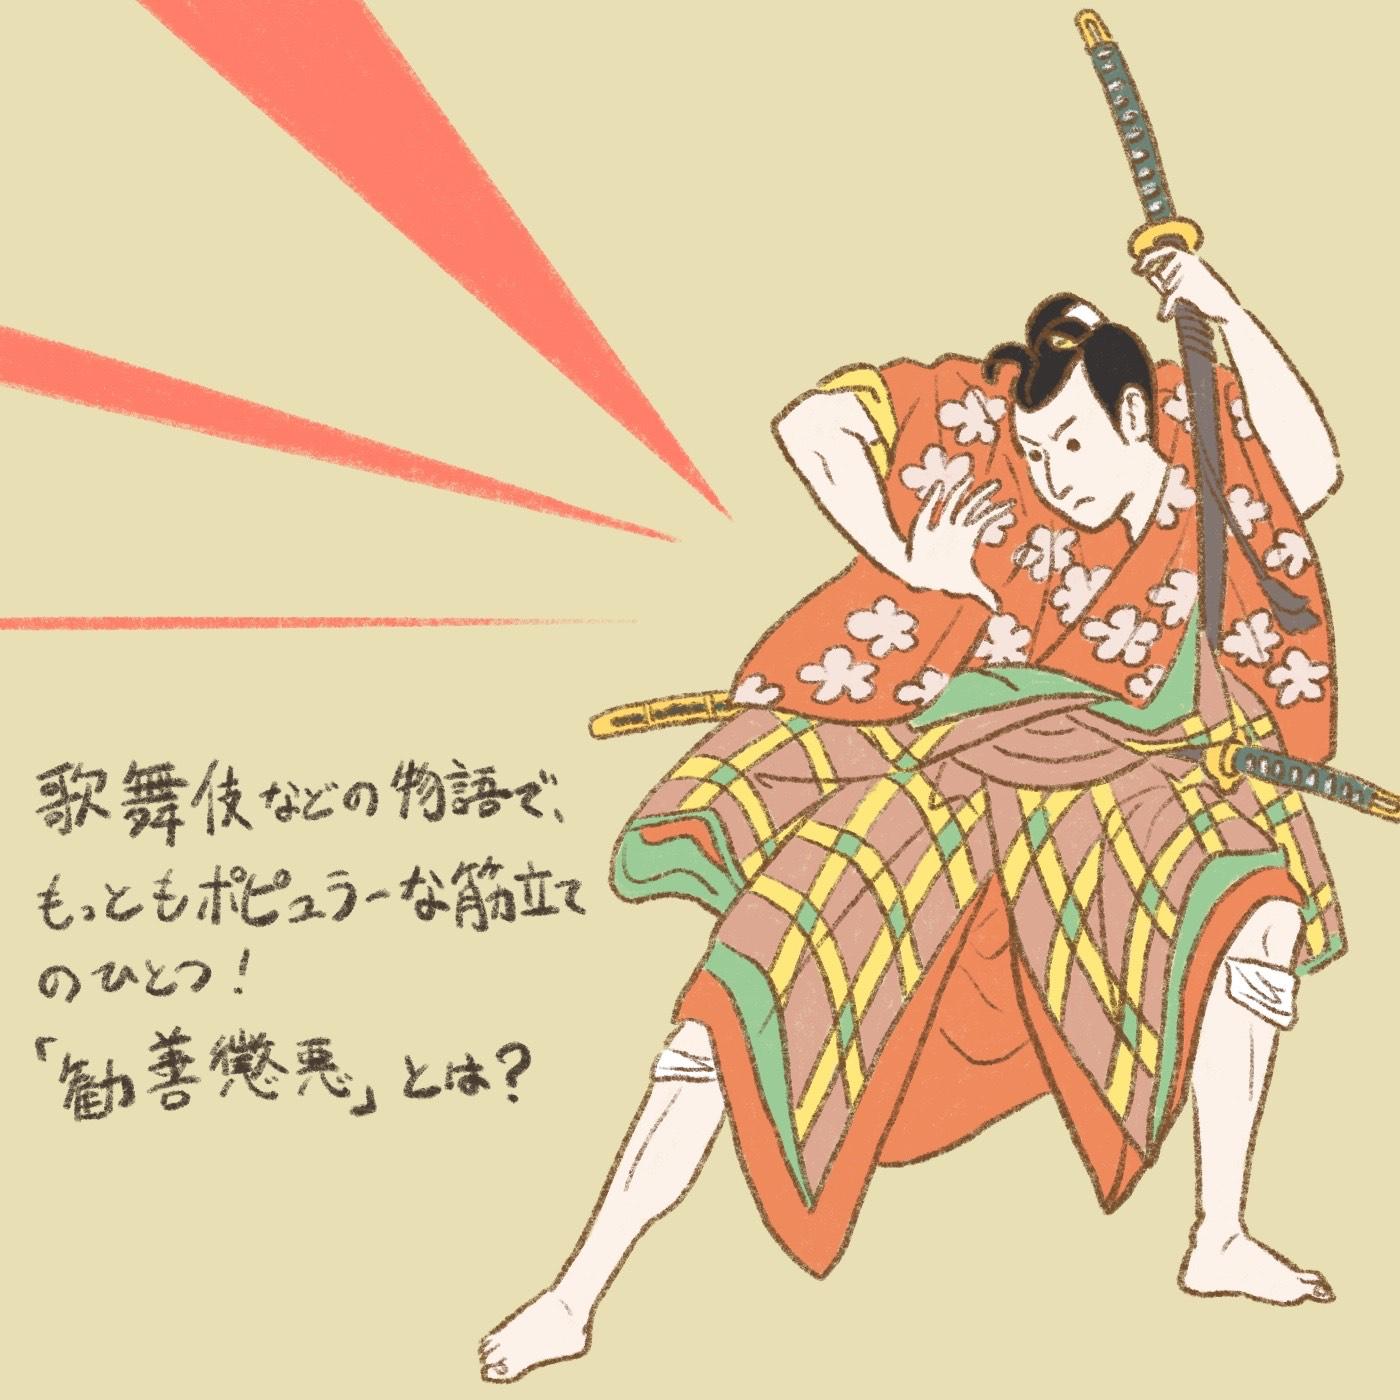 OBIKAKE ナニソレ 歌舞伎 勧善懲悪 つちやさや